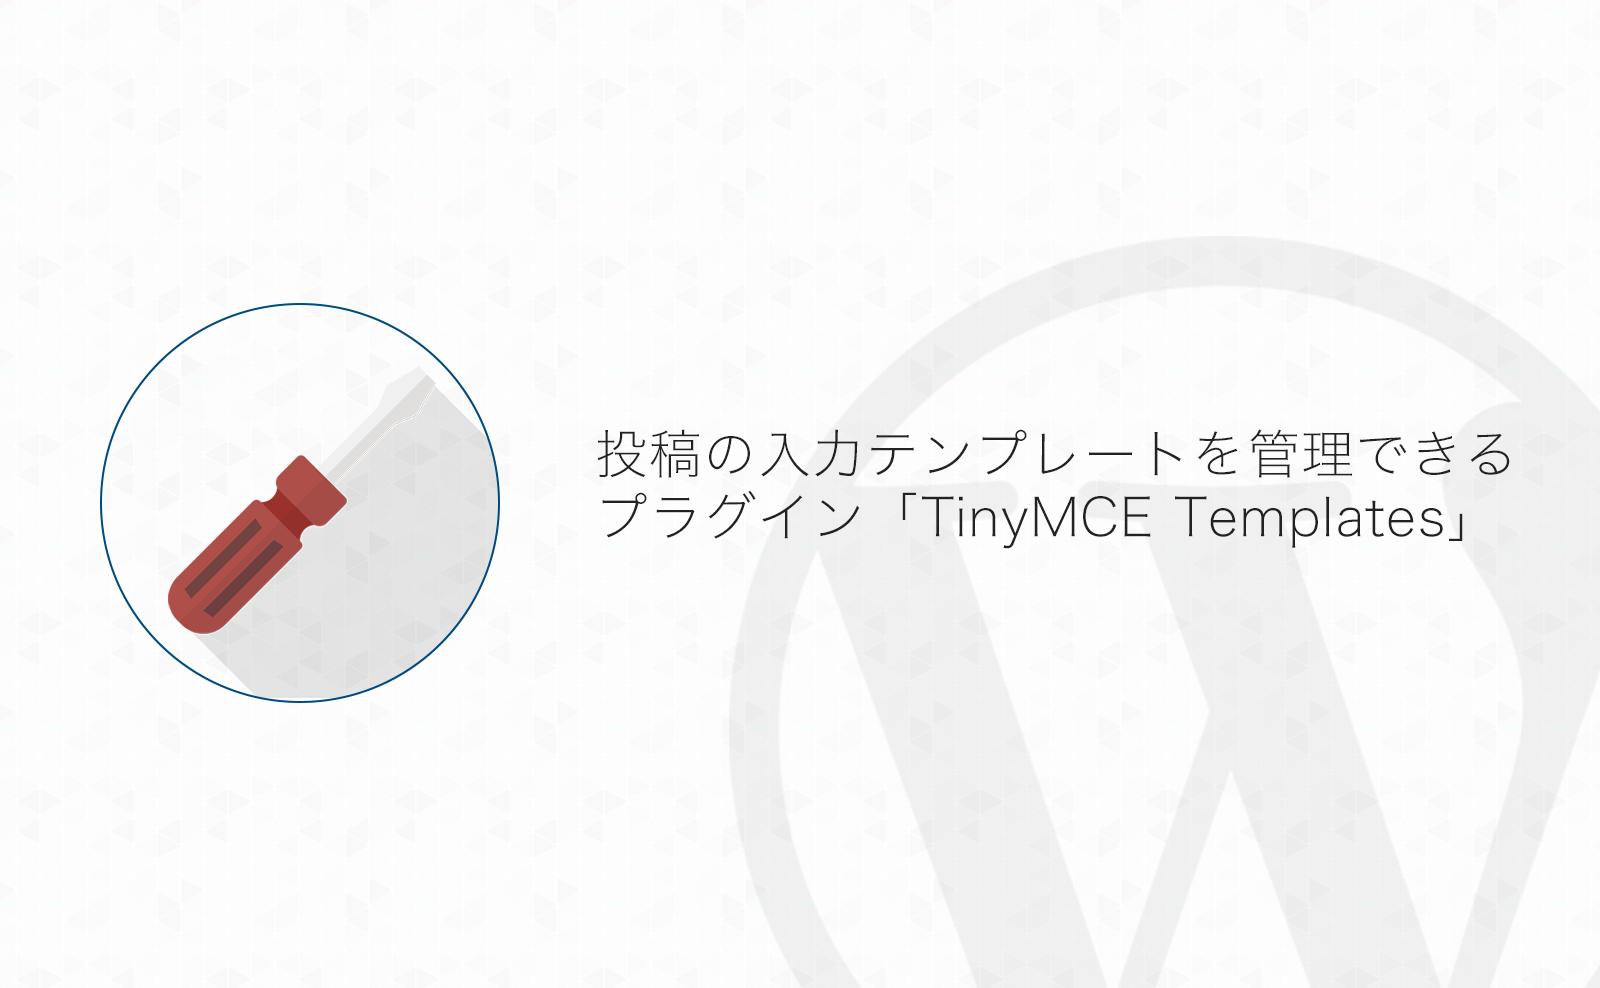 【WordPress】定型文をテンプレート管理して投稿に簡単入力・ショートコード化出来るプラグイン「TinyMCE Templates」